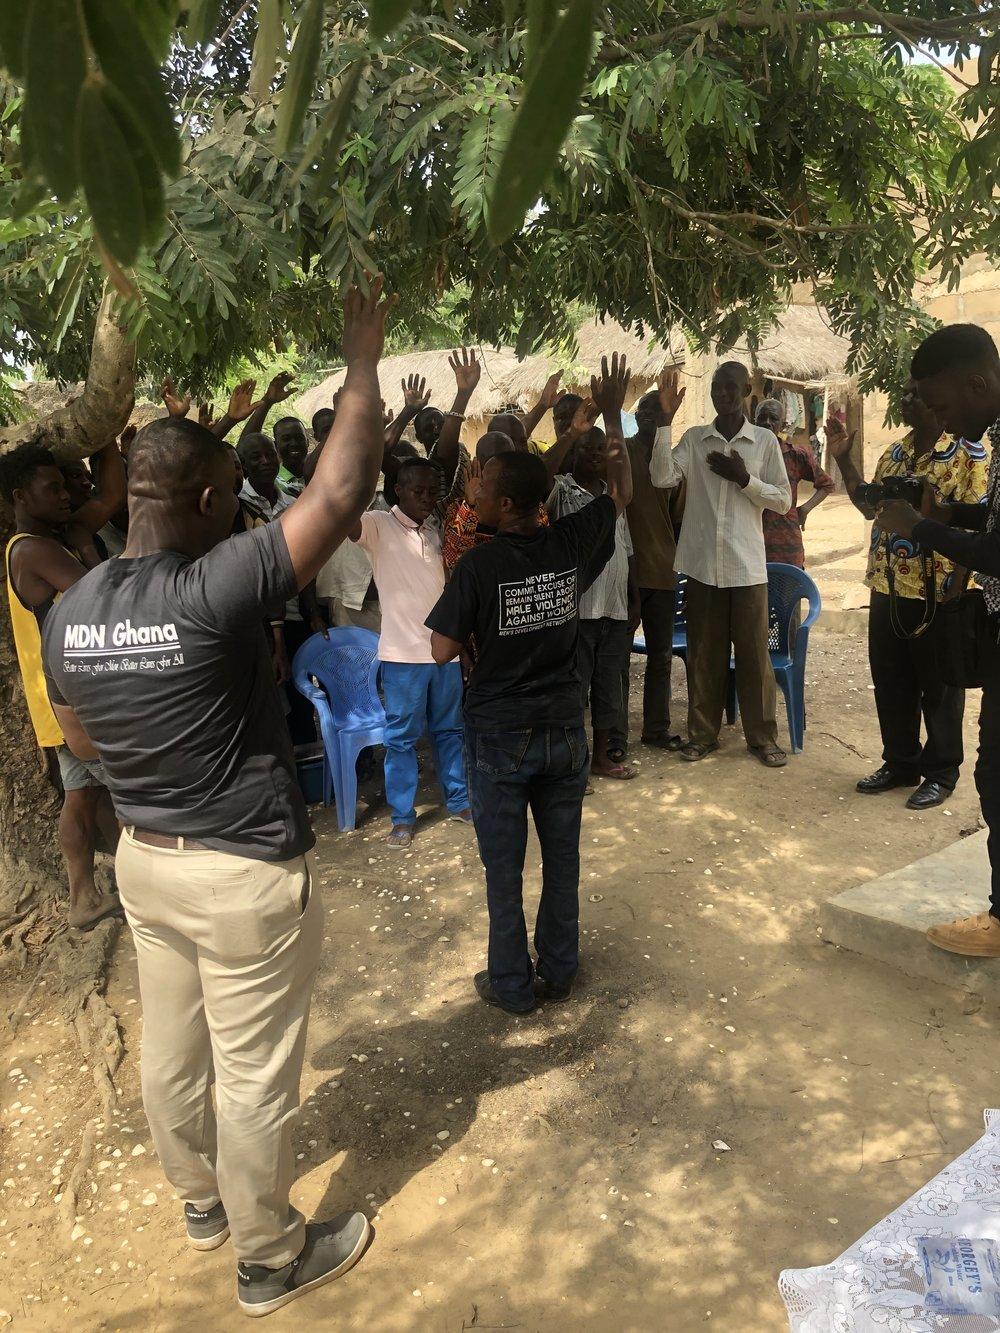 Villagers in Ghana taking the White Ribbon pledge.